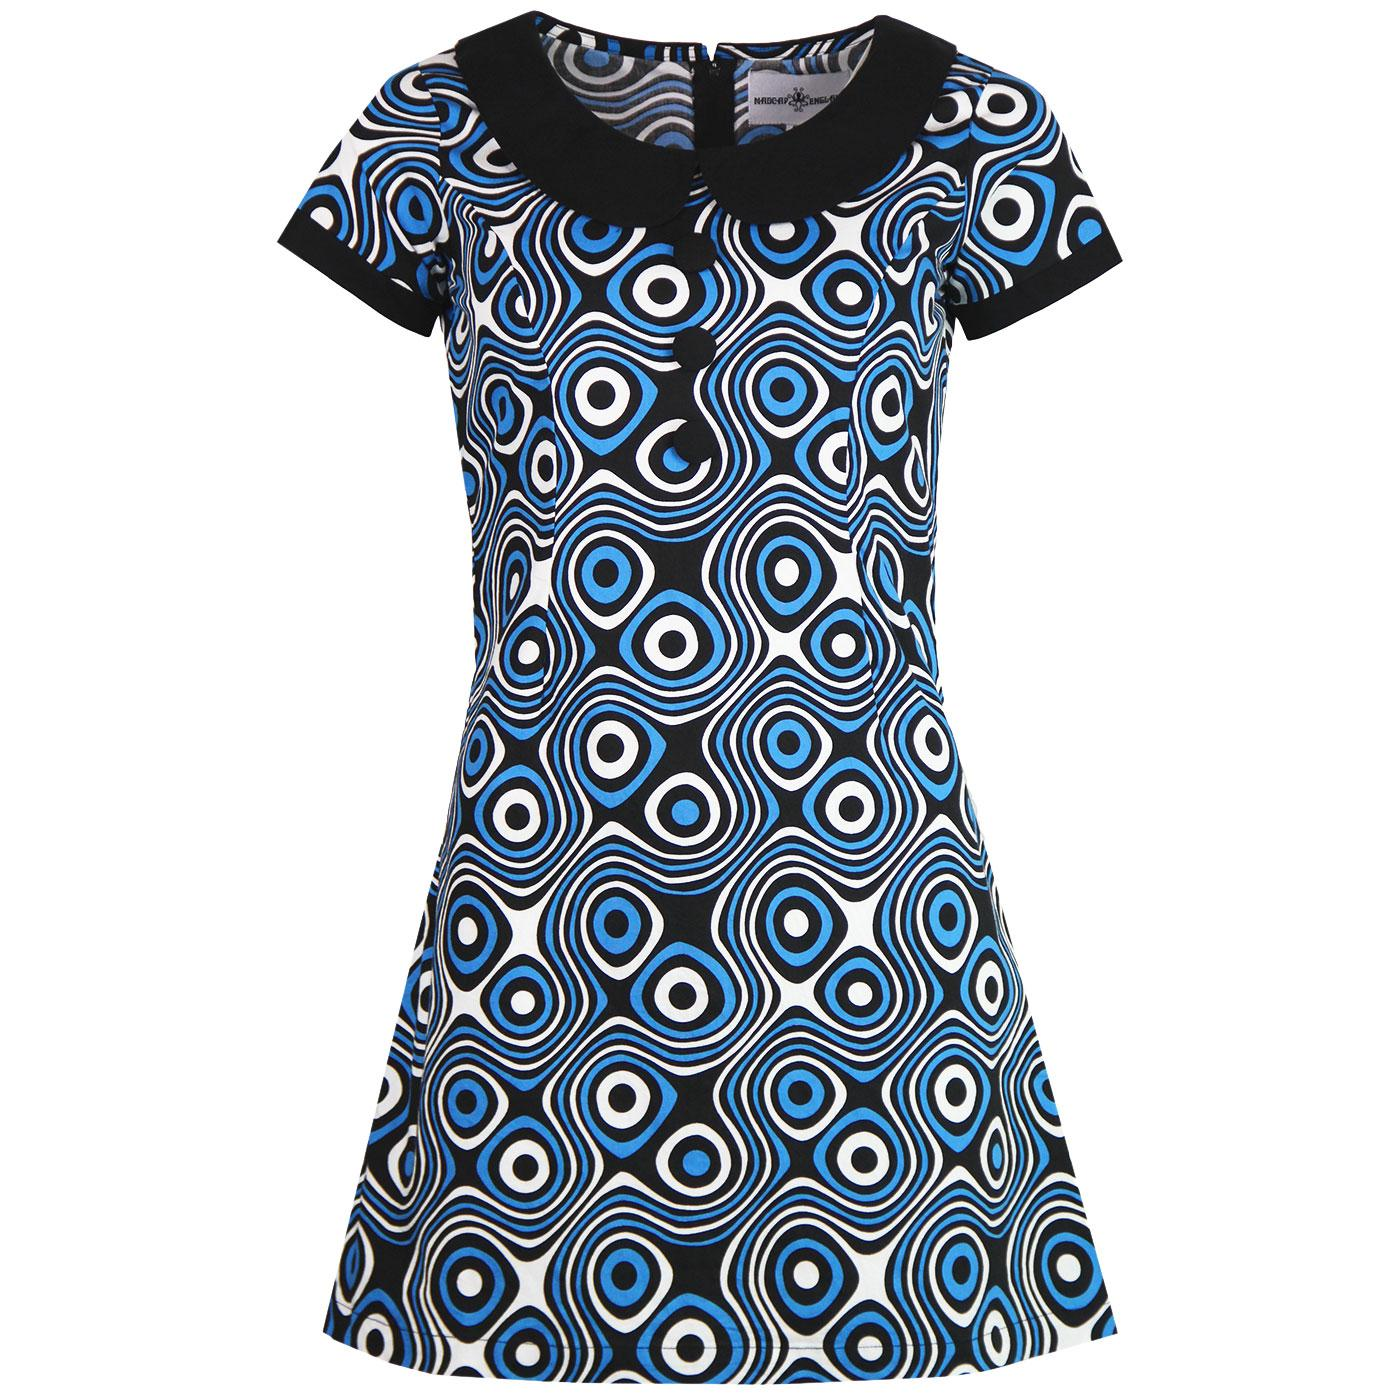 Dollierocker Op Art MADCAP ENGLAND Mod Dress BLUE